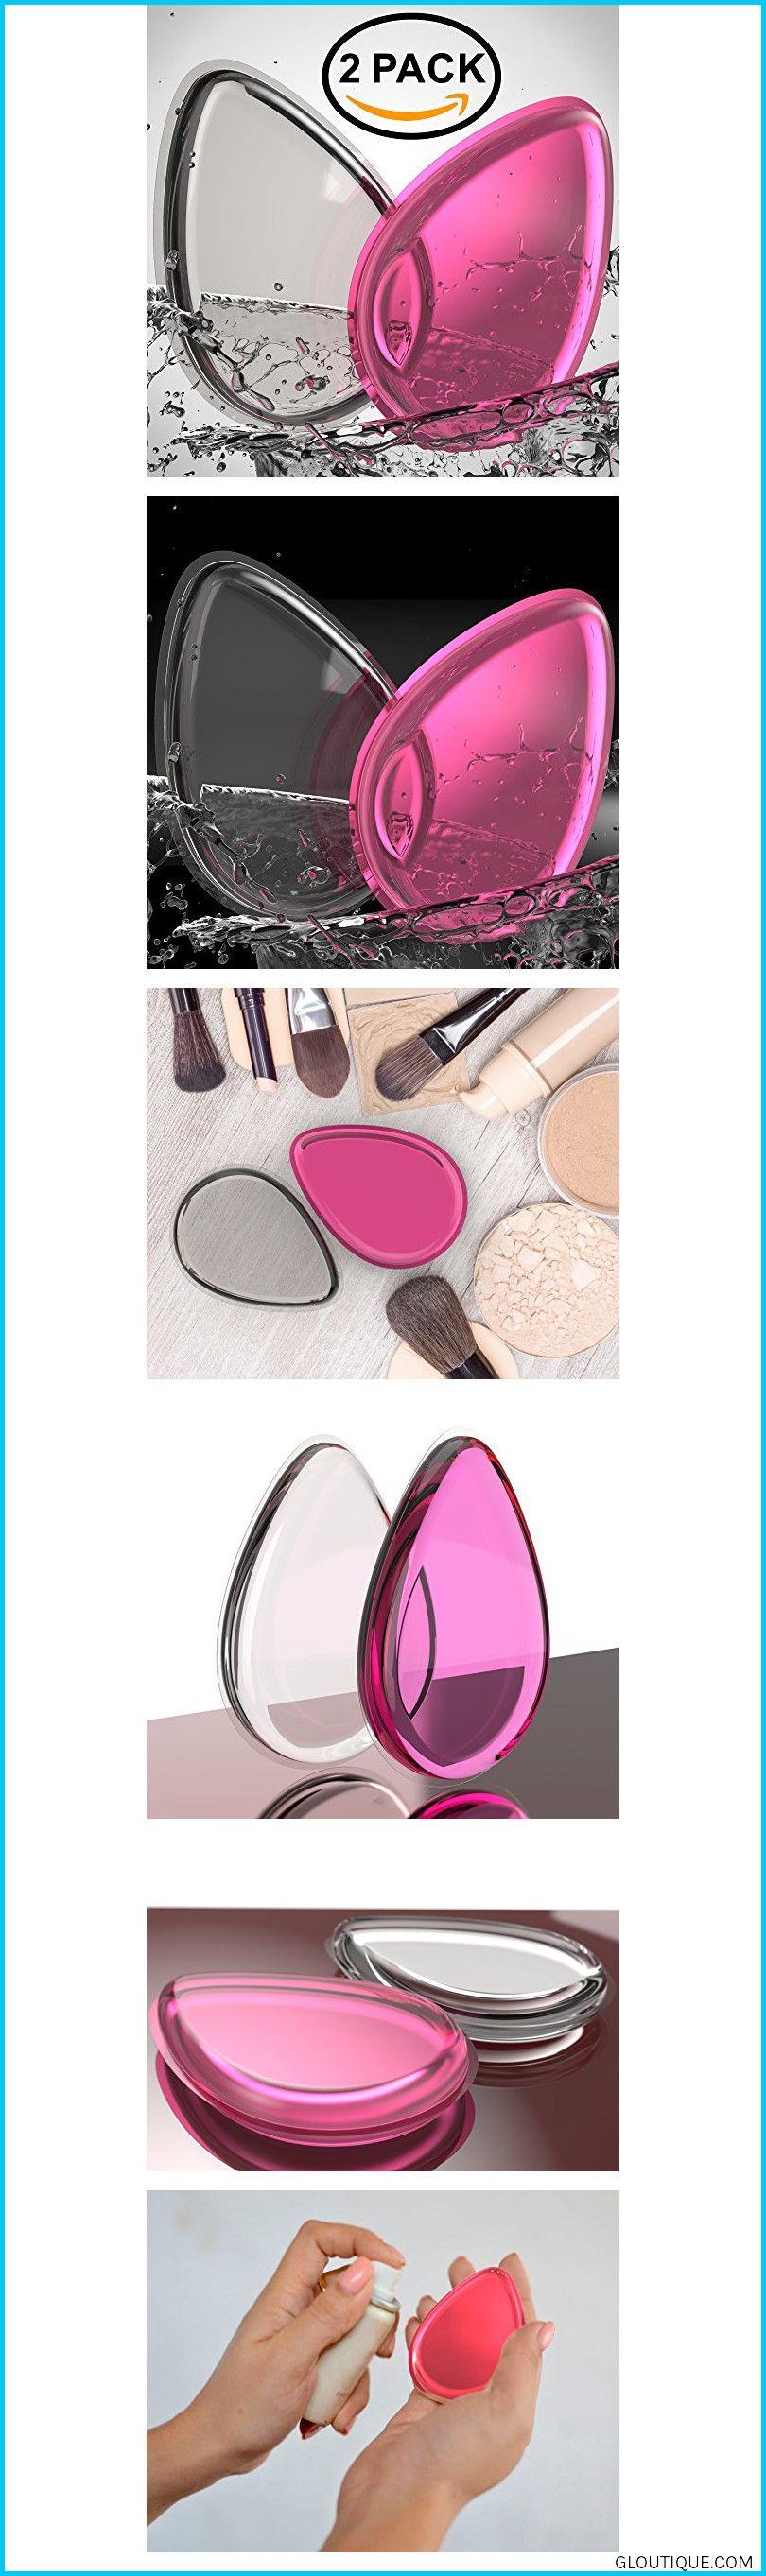 Silicone Makeup Sponge 2Pack Beauty Makeup Blender For